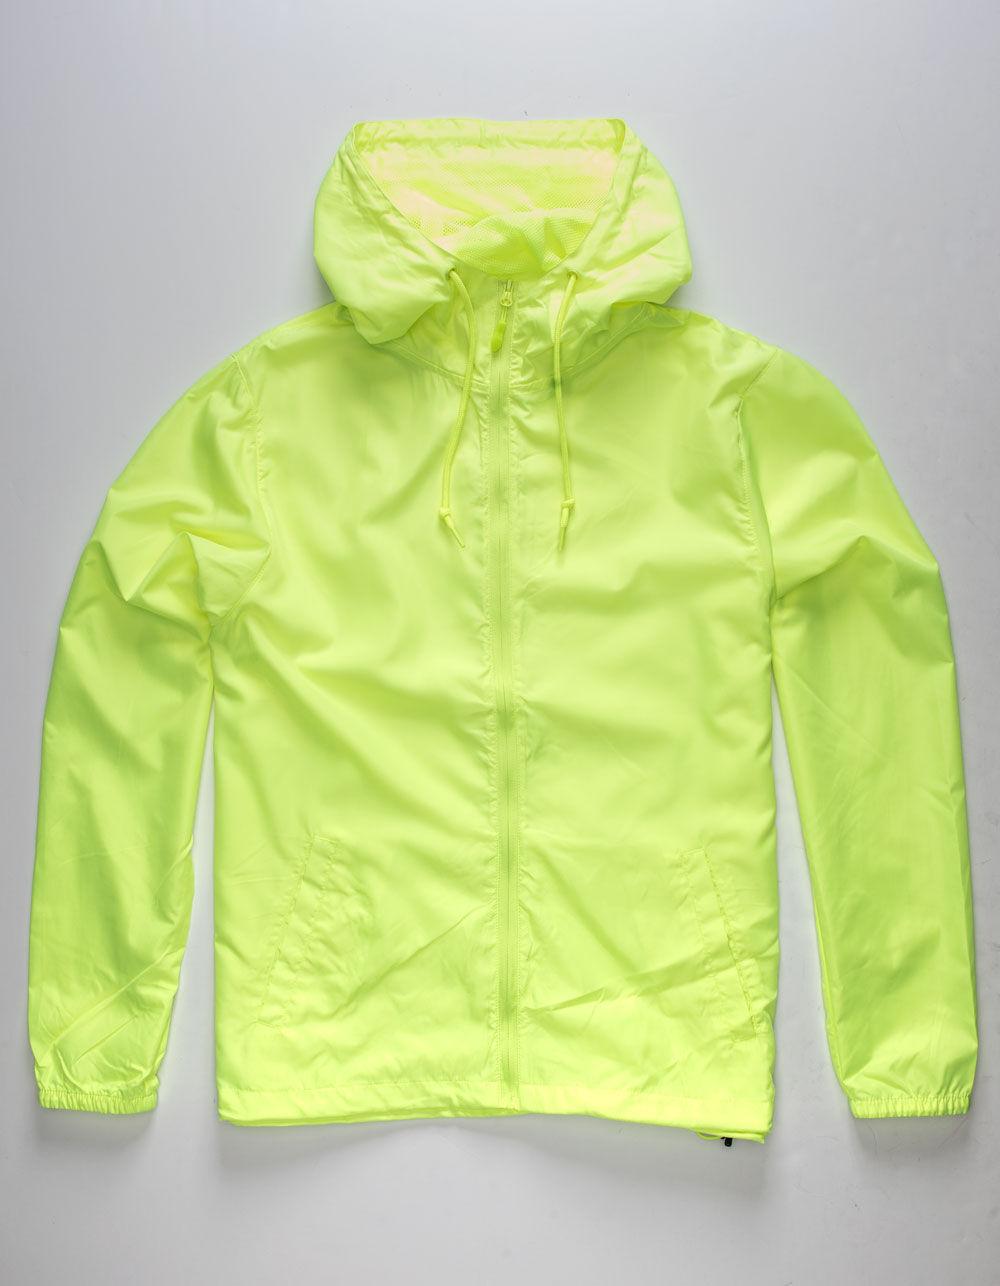 INDEPENDENT TRADING COMPANY Lightweight Neon Yellow Windbreaker Jacket